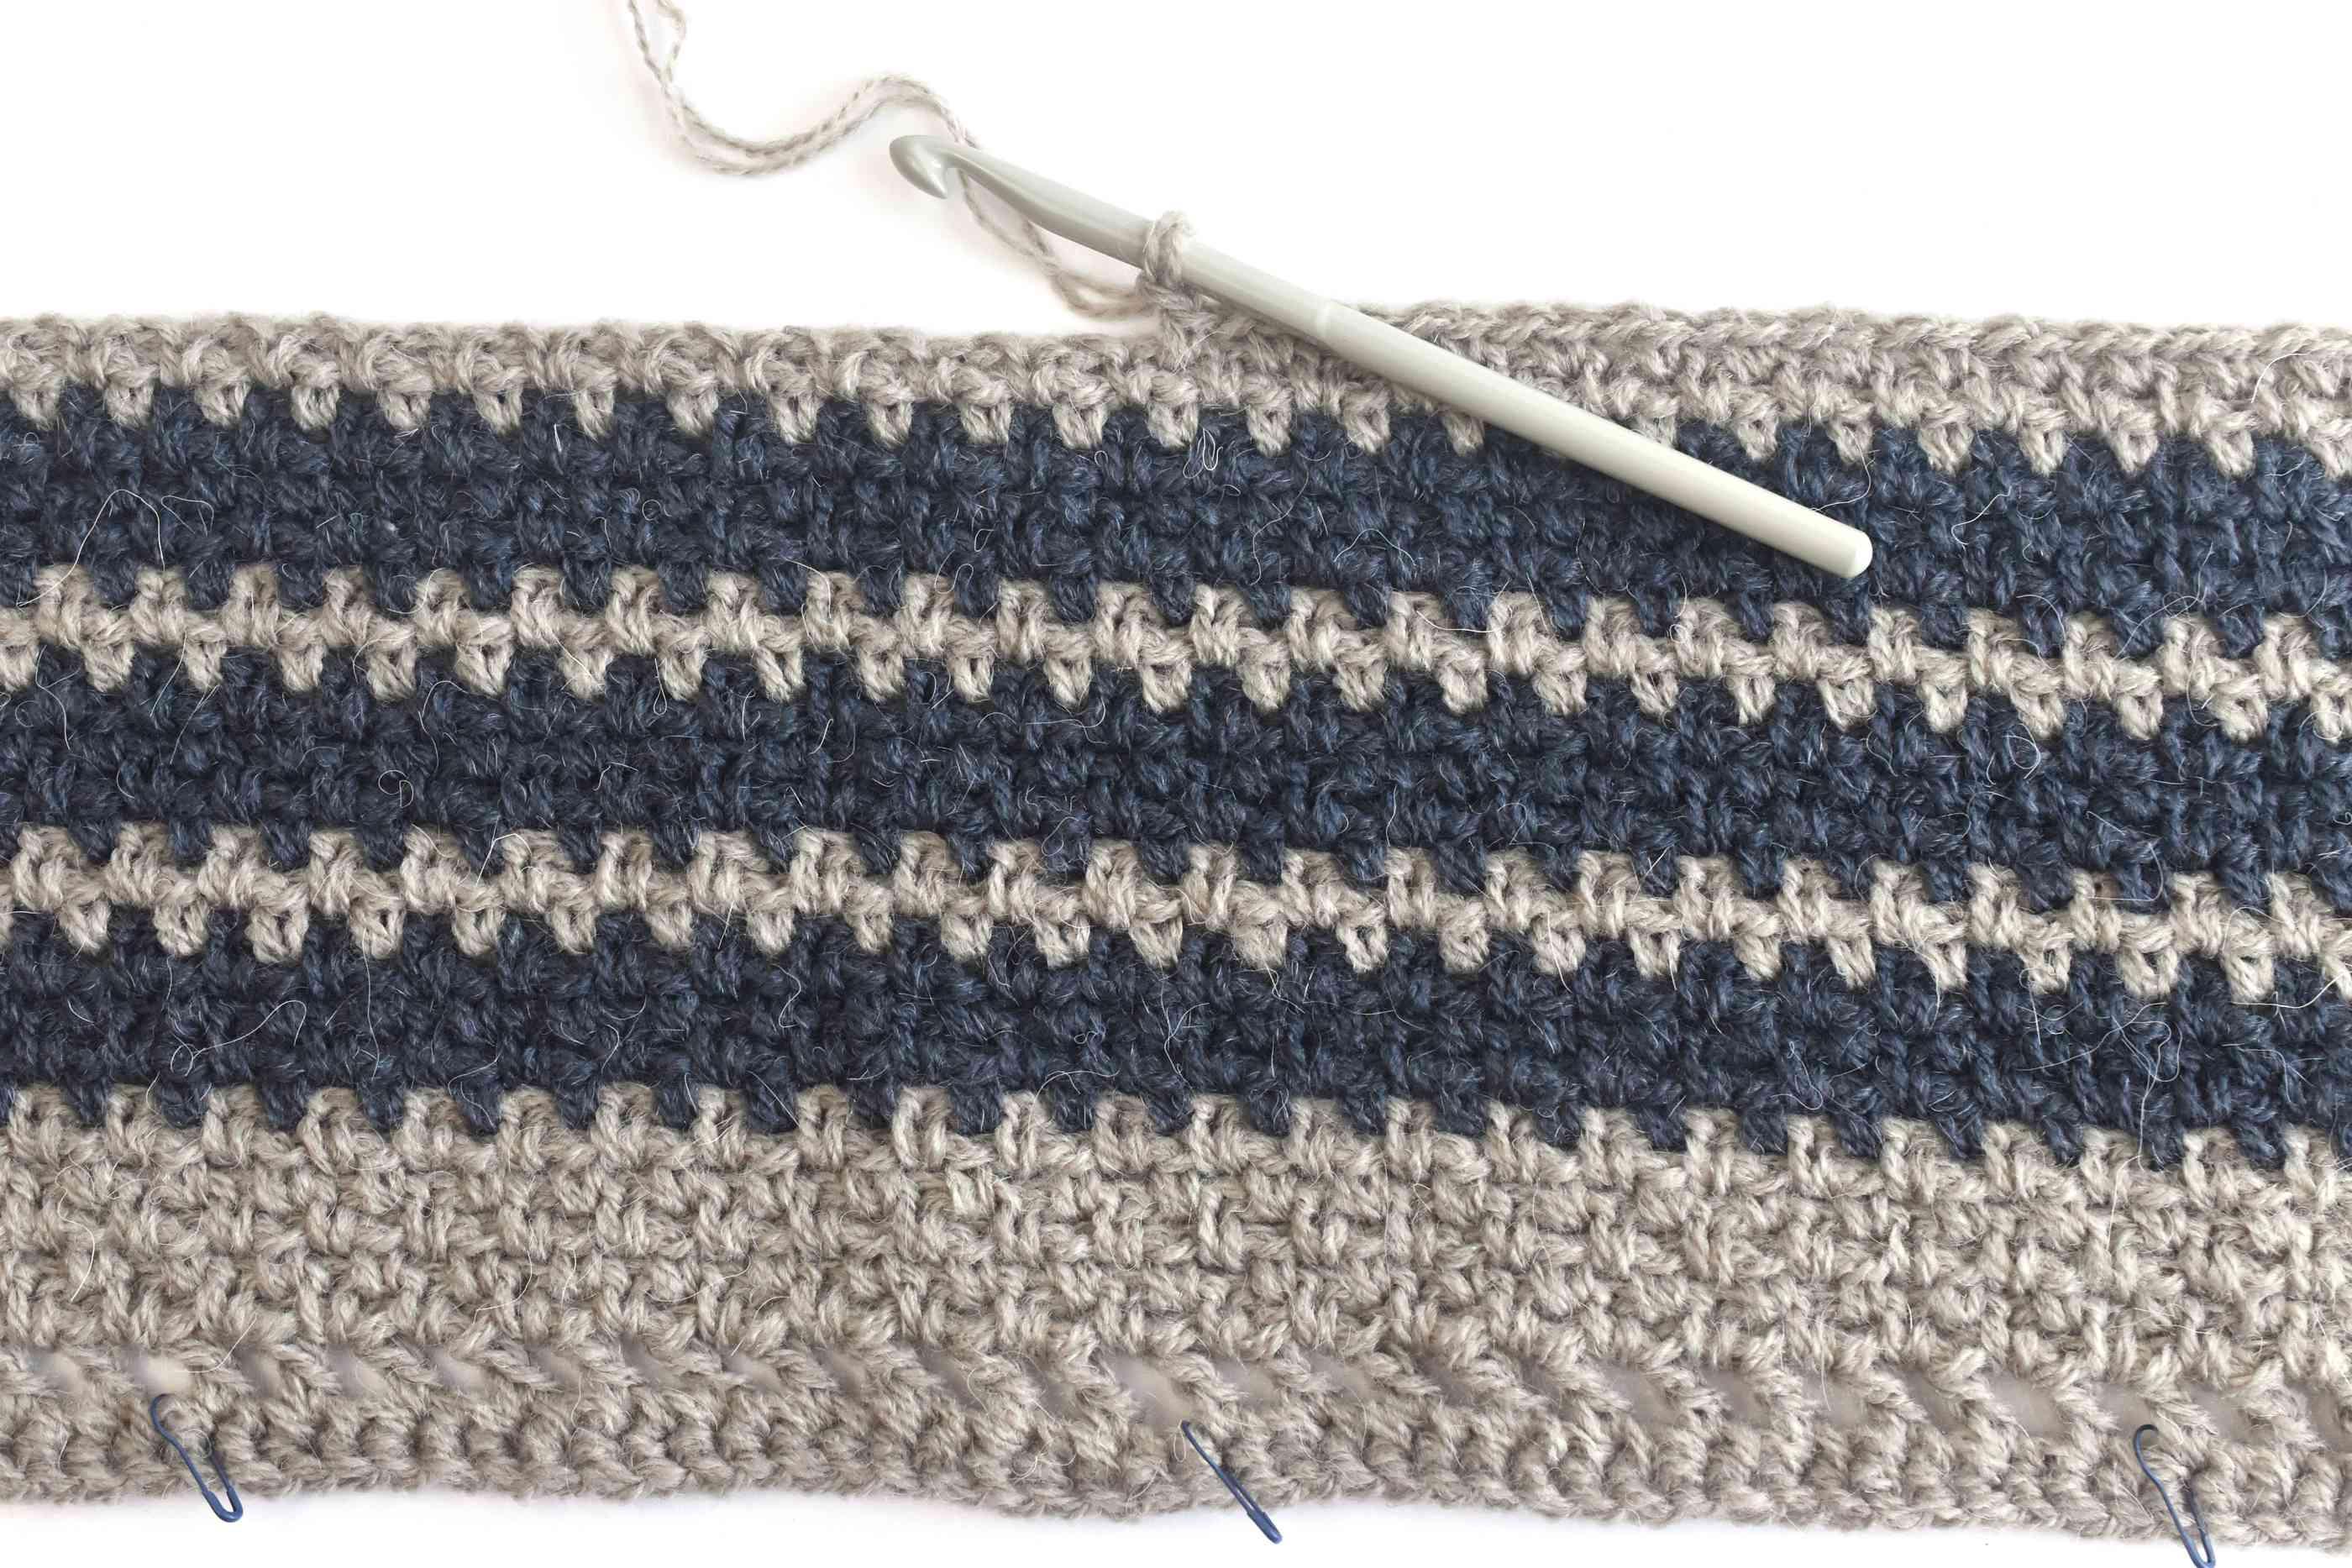 Crochet Rows of Moss Stitch